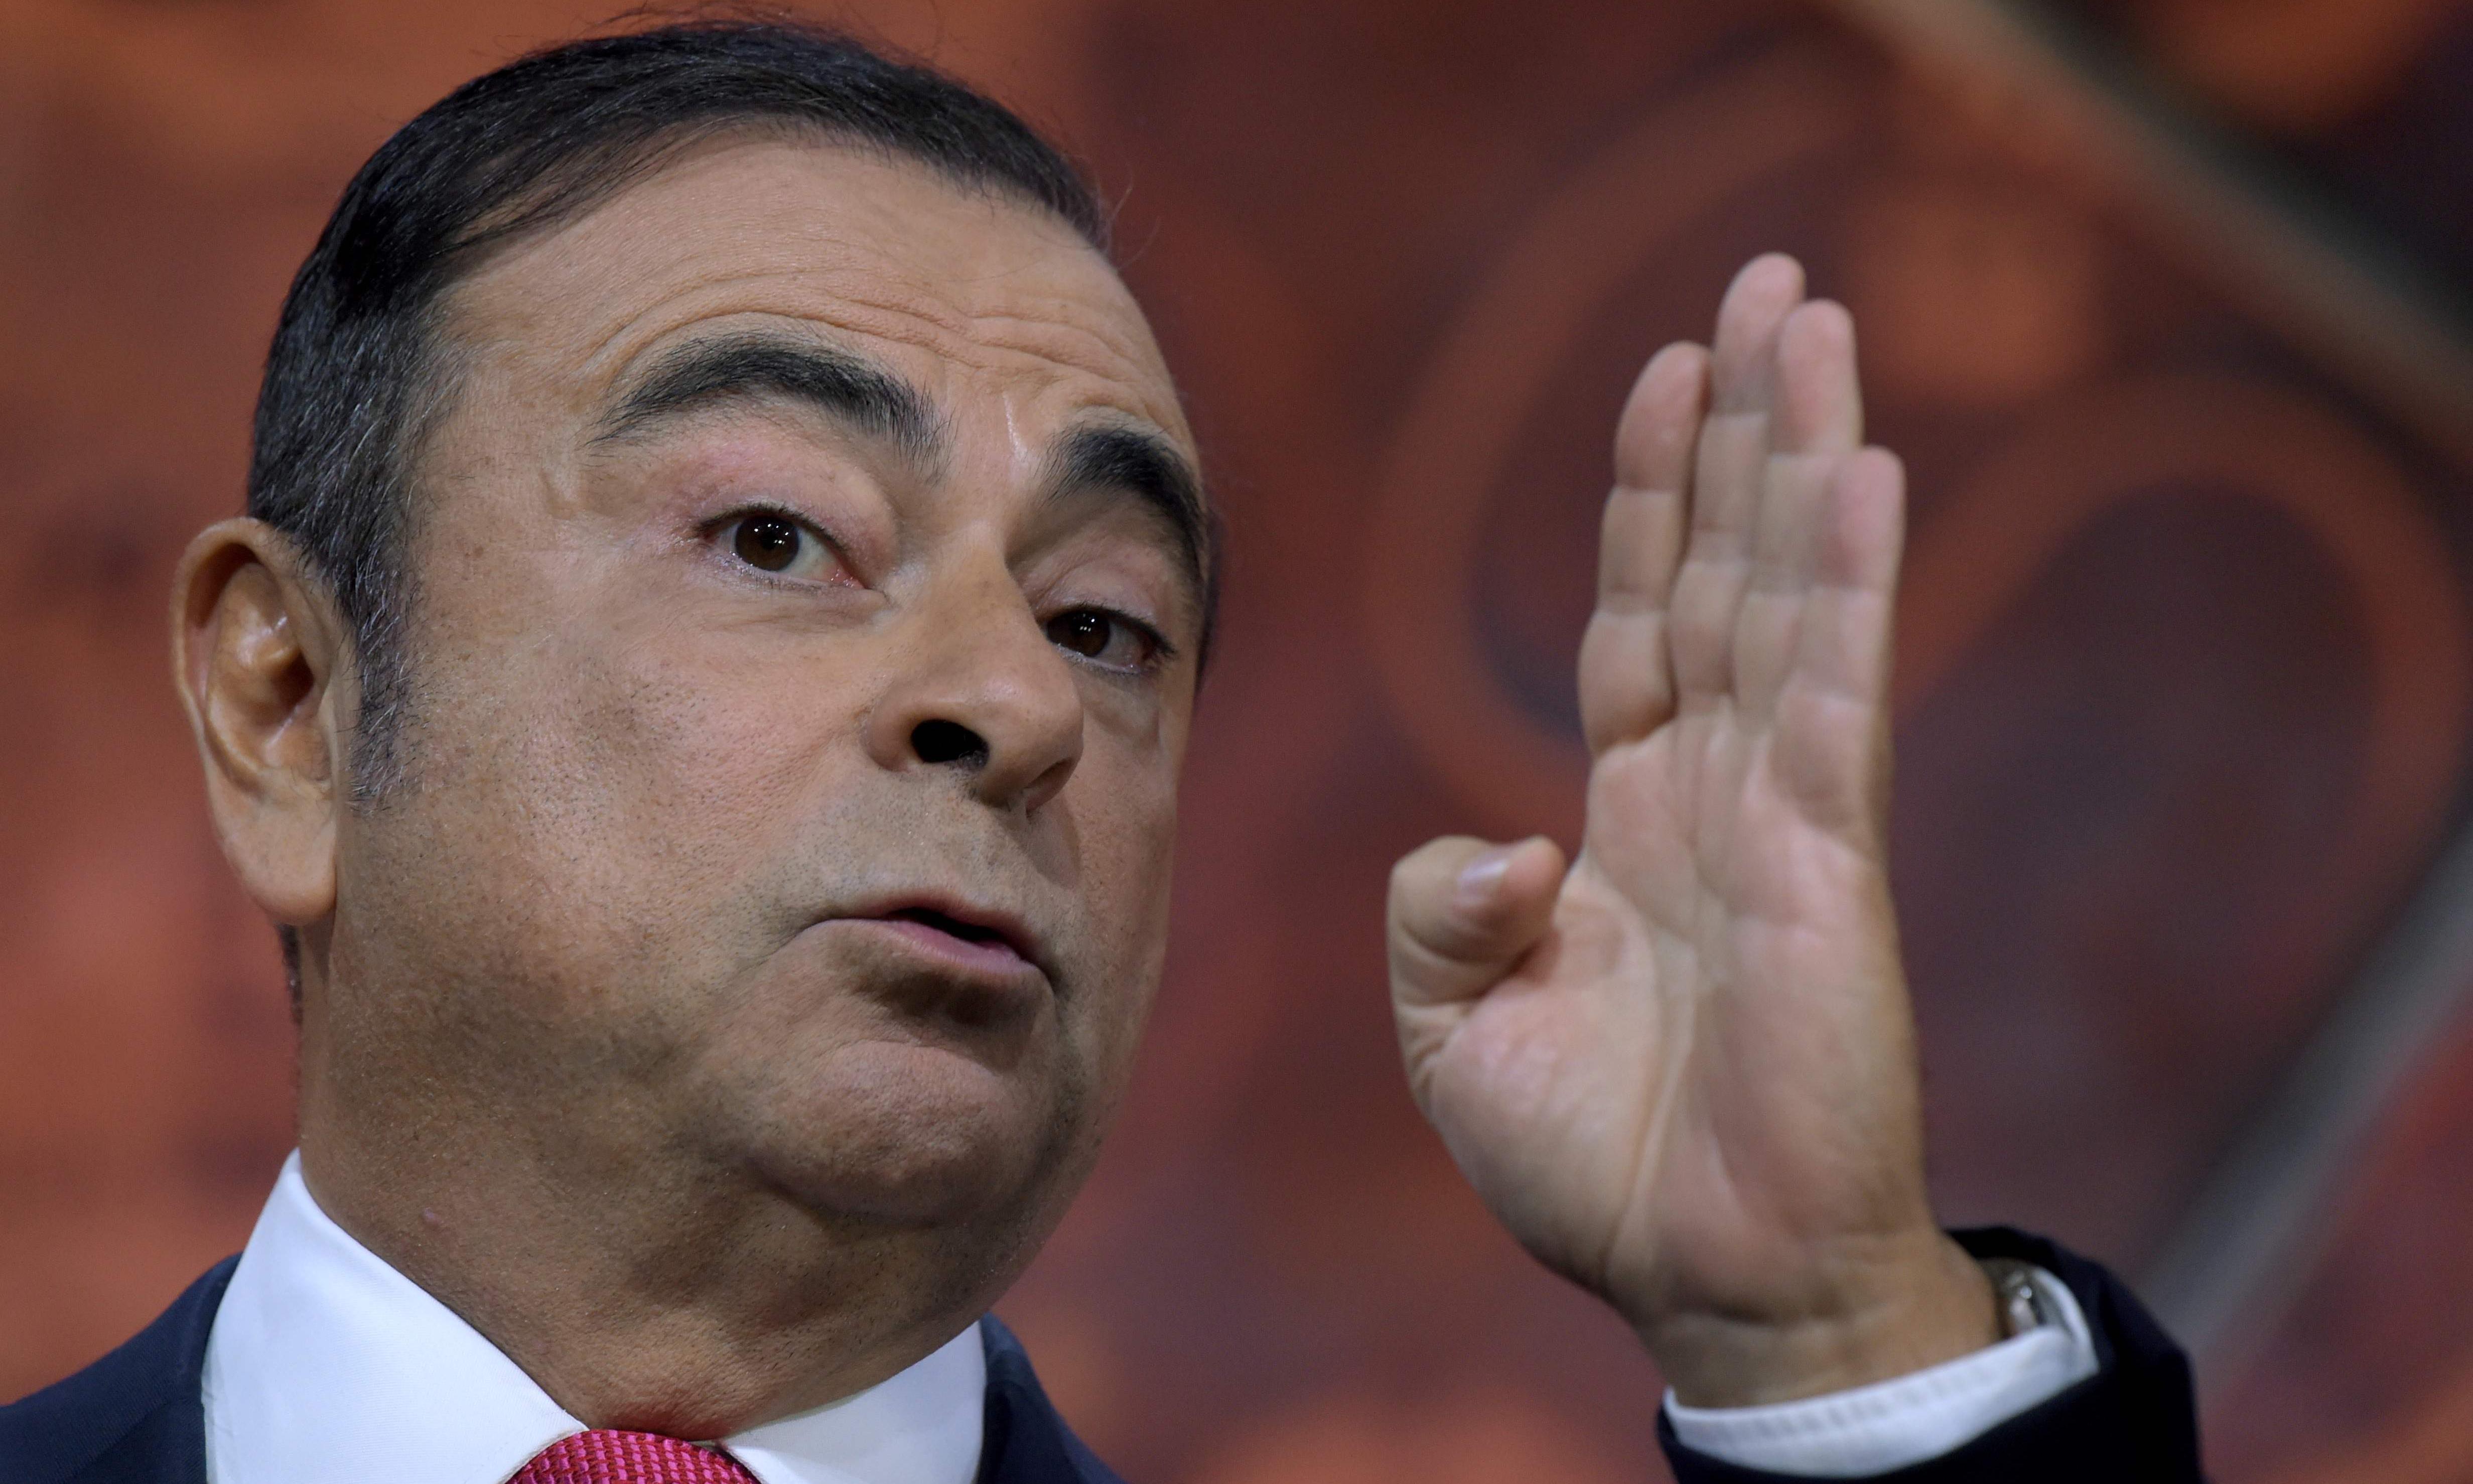 Carlos Ghosn: Nissan scandal slams brakes on cost killer's career